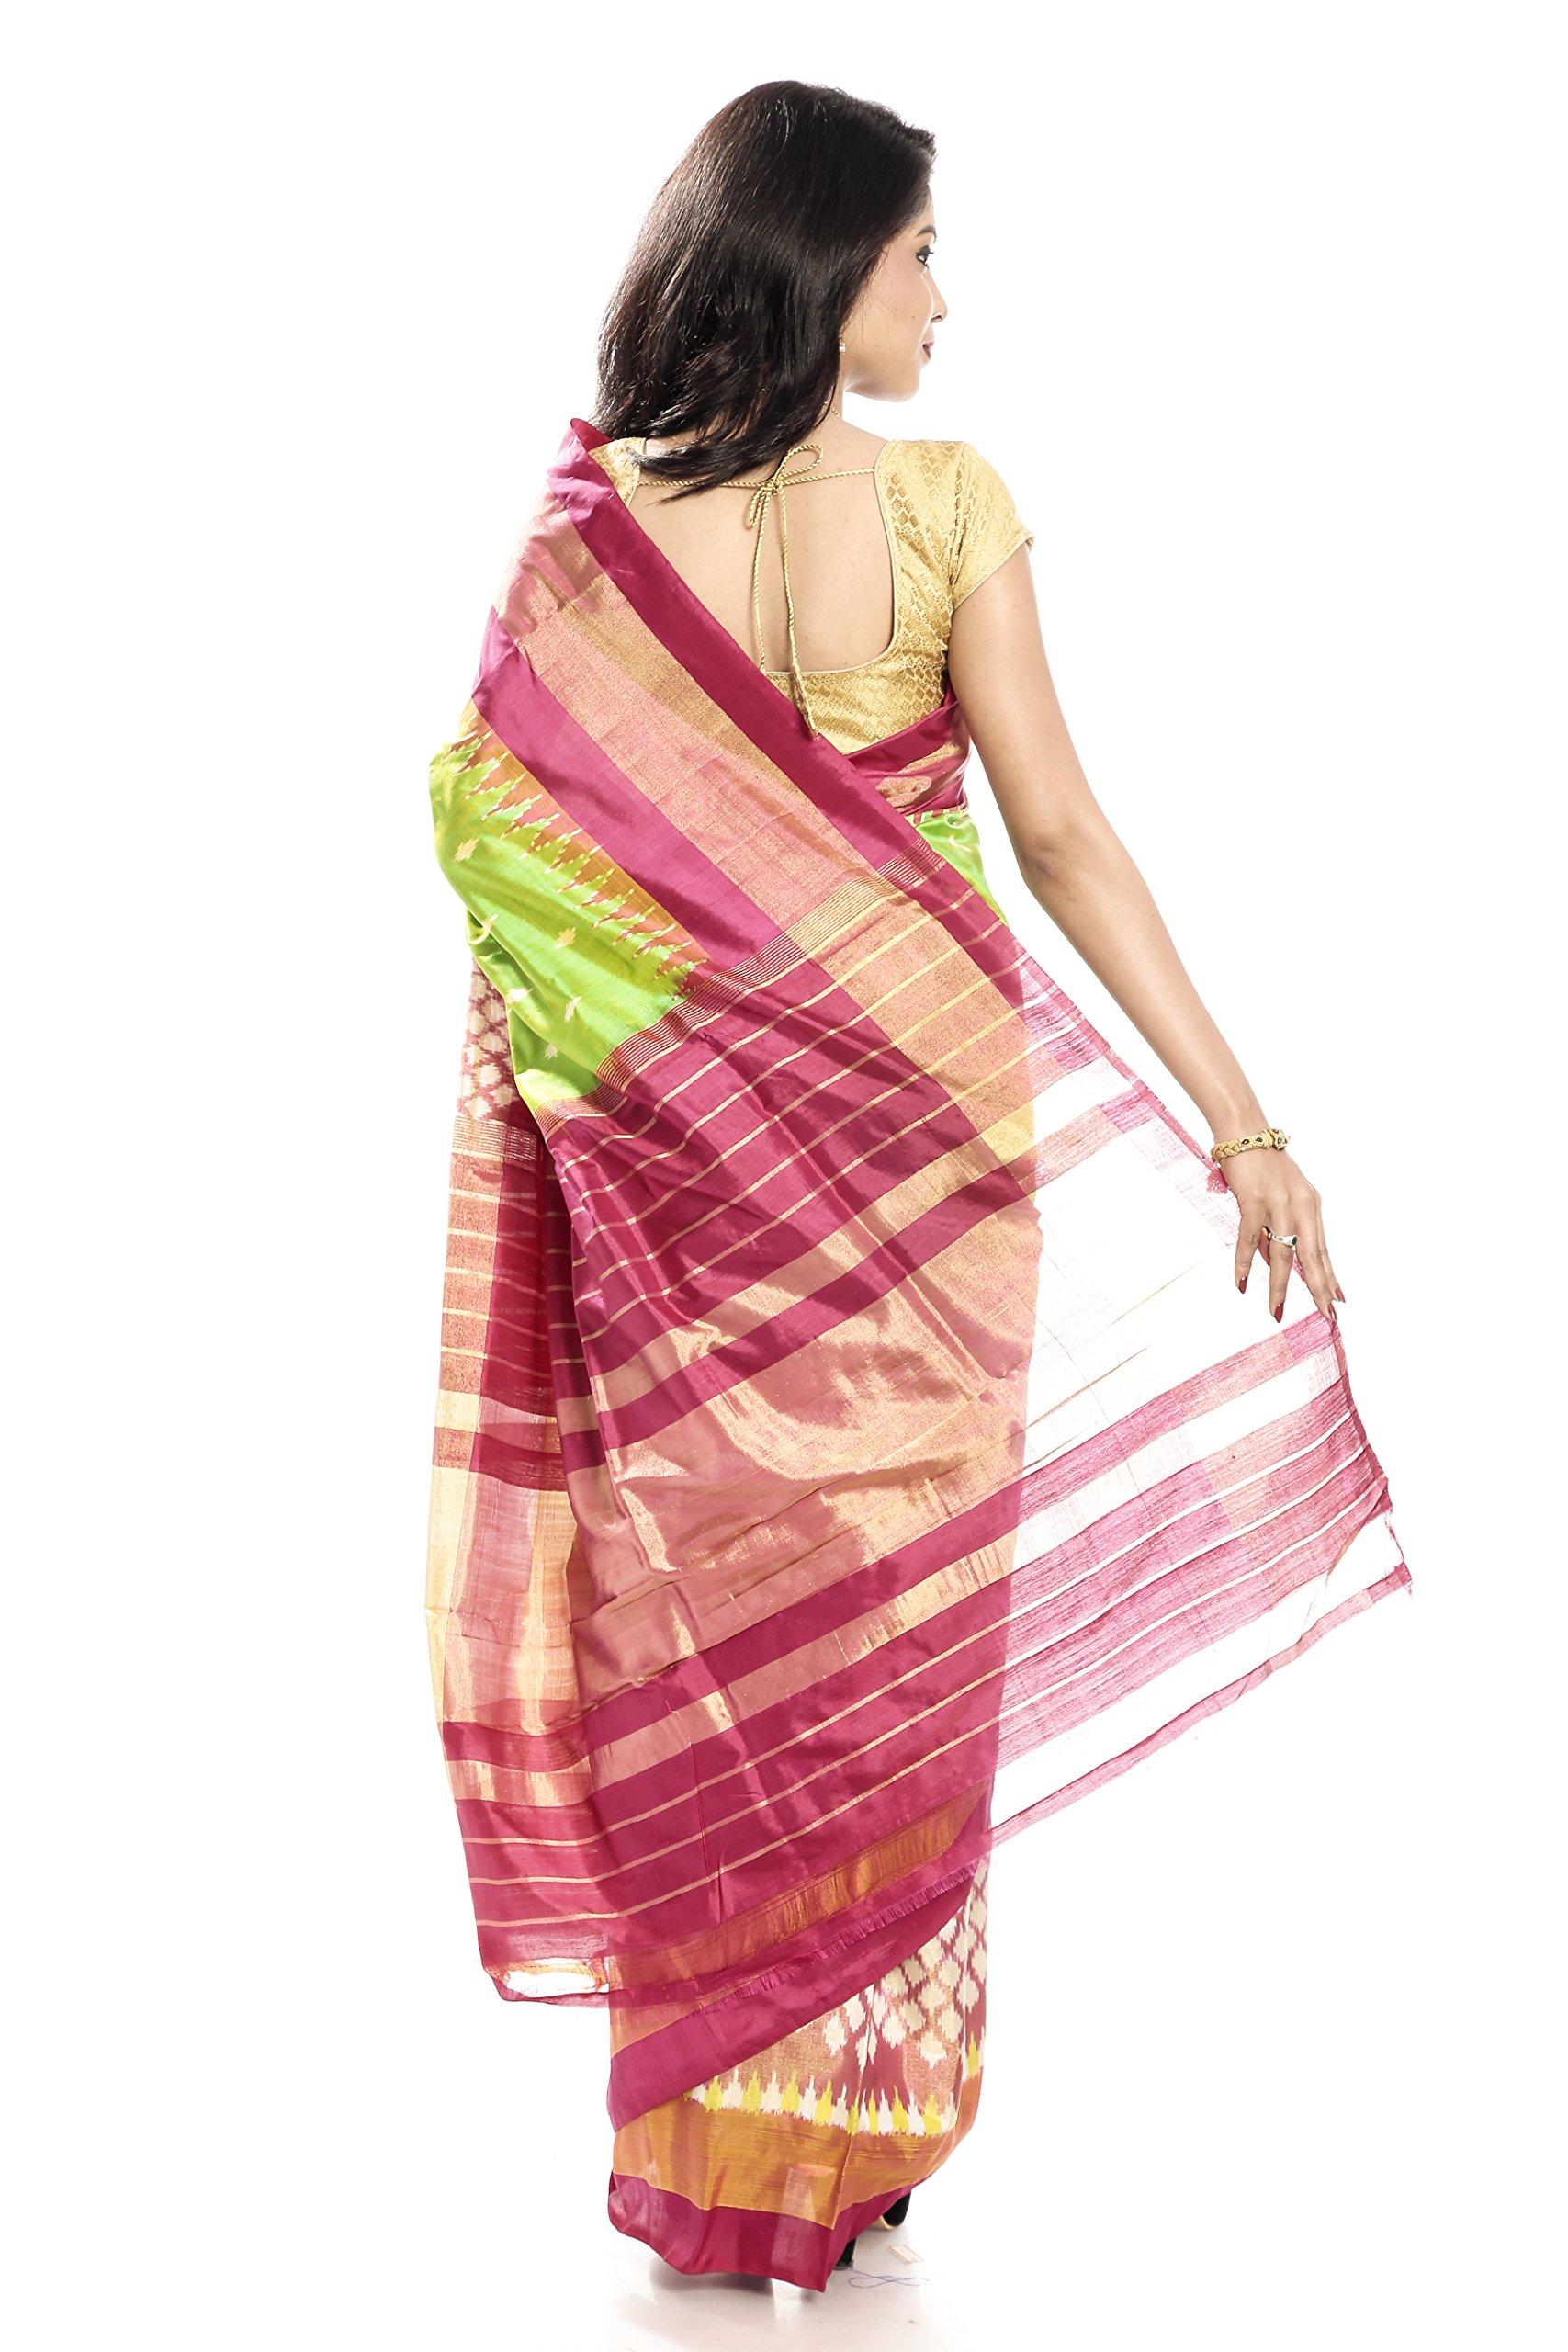 Mandakini — Indian Women's Pochampally - Handloom - Ikat Pure Silk Saree (Pink-Green ) (MK303) by Mandakini (Image #5)